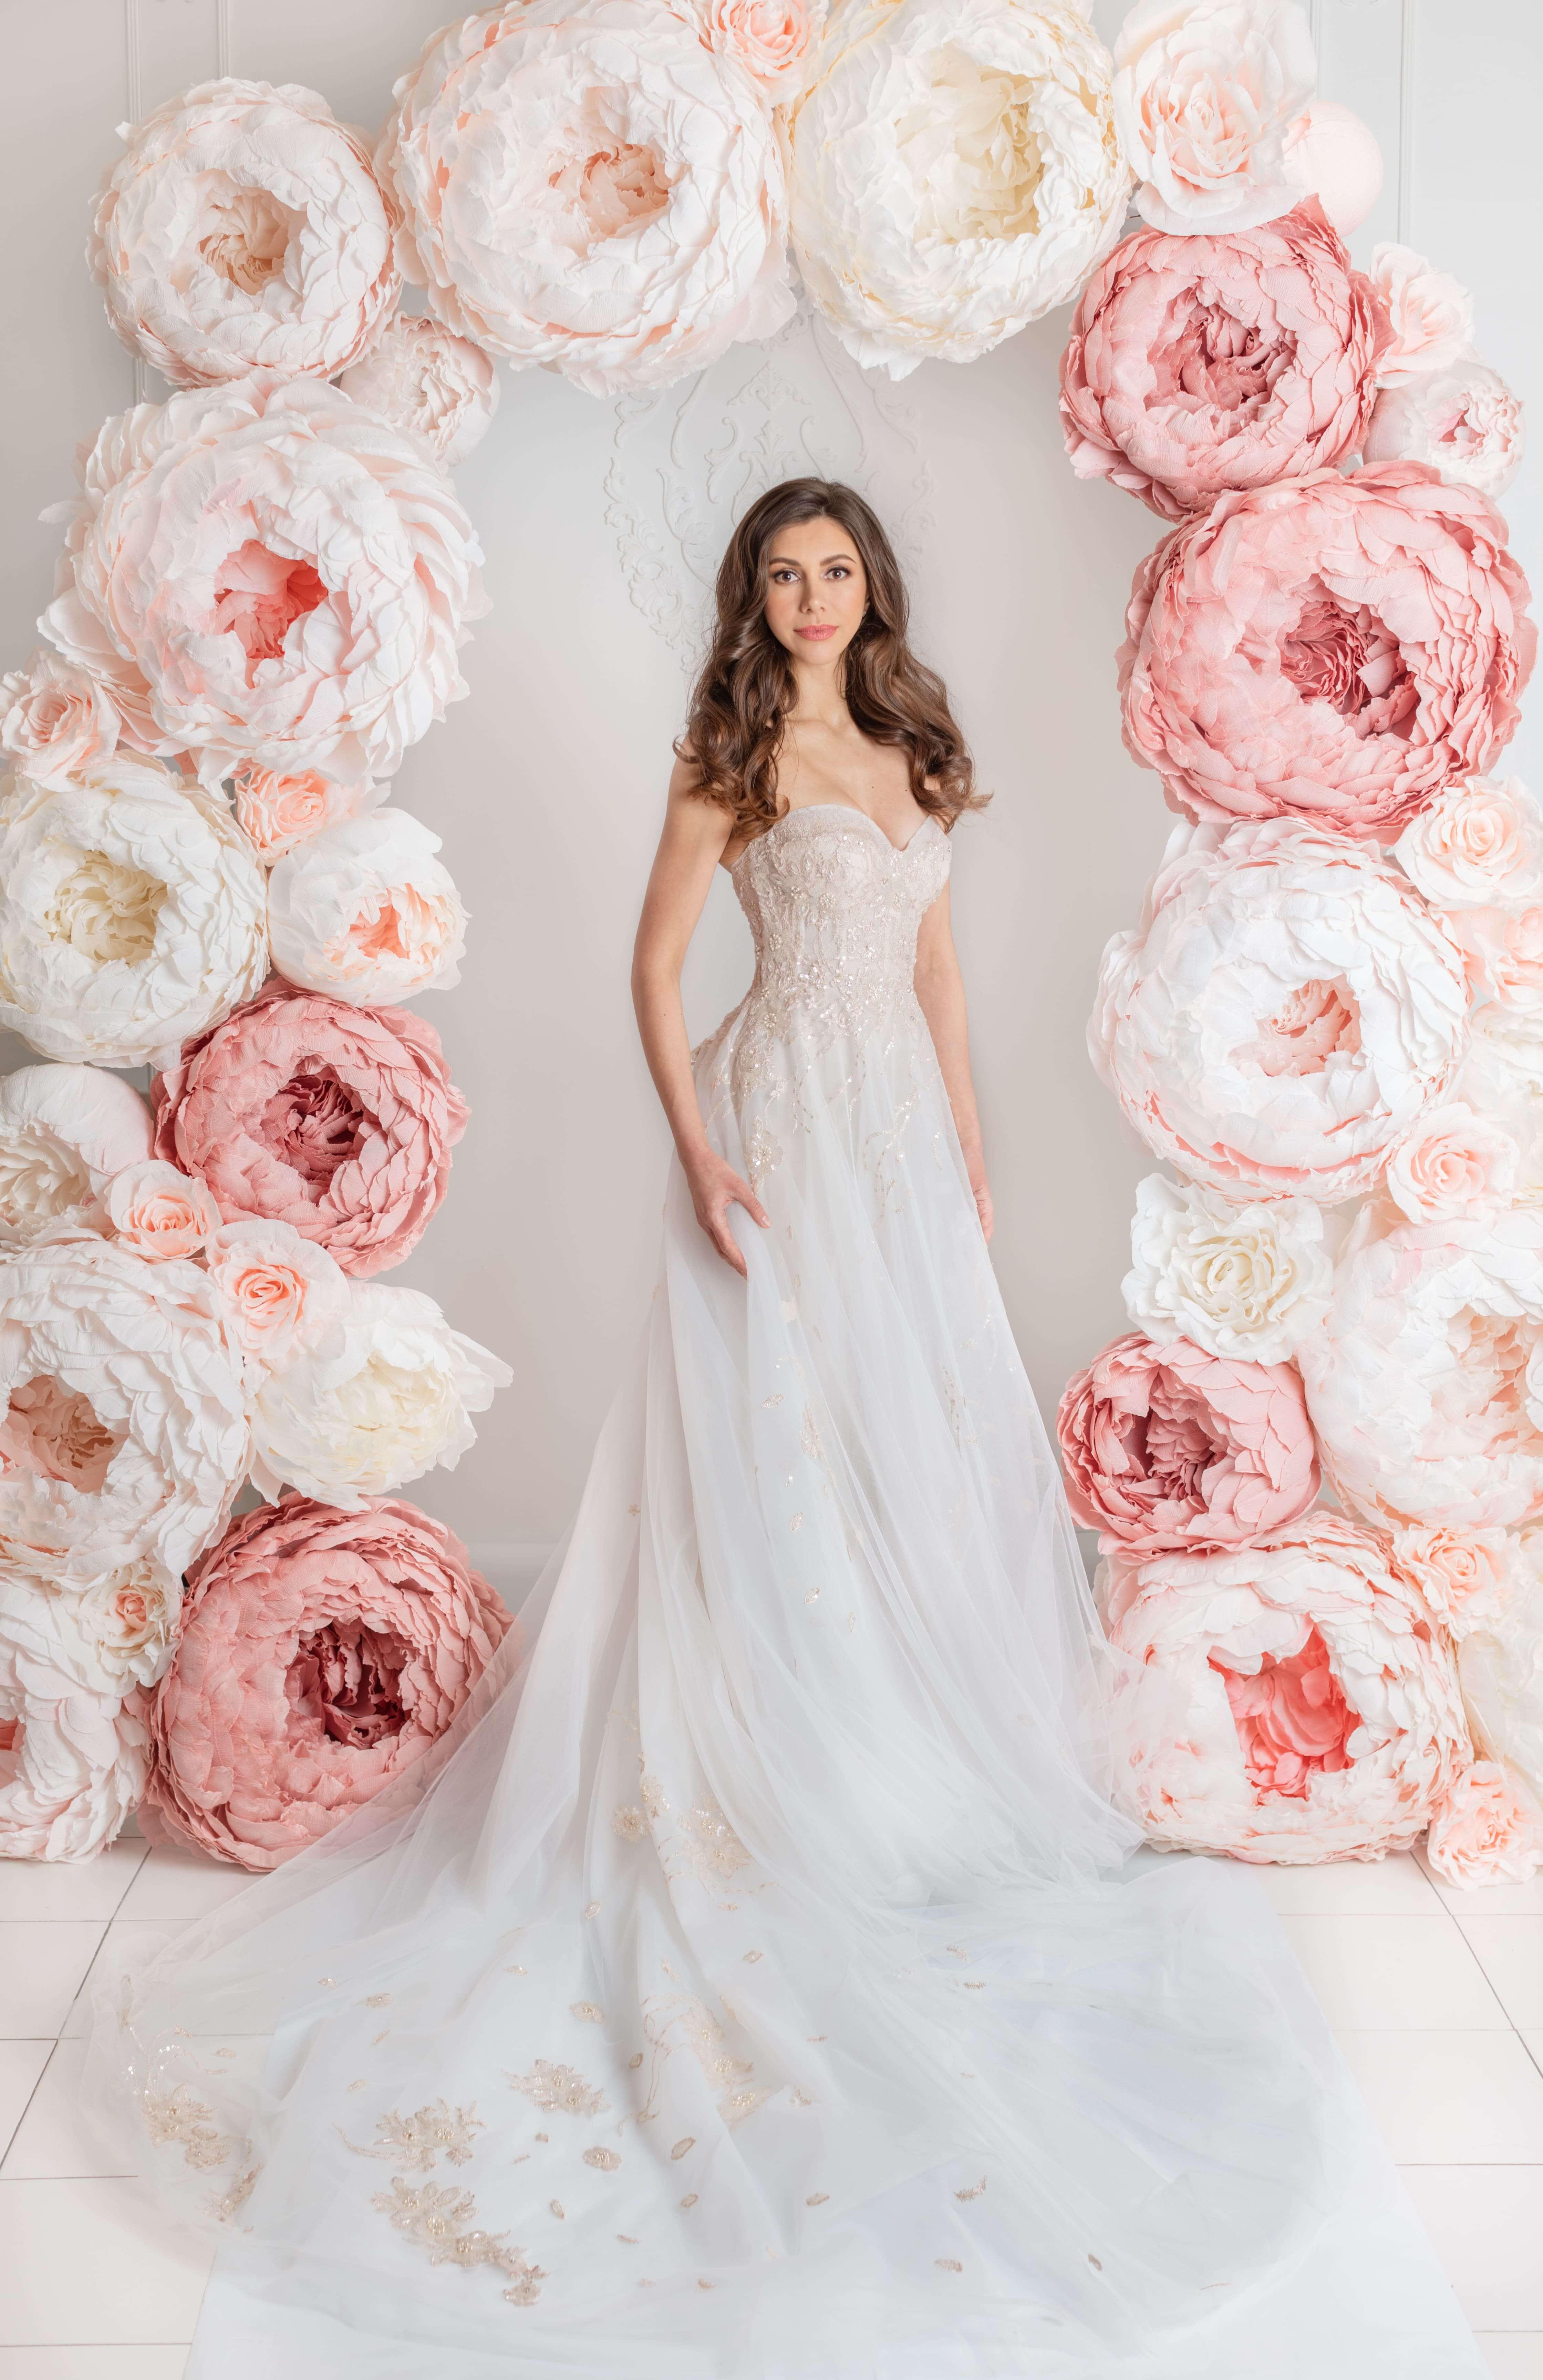 lilia haute couture robes de mariee montreal robe de mariee style princesse